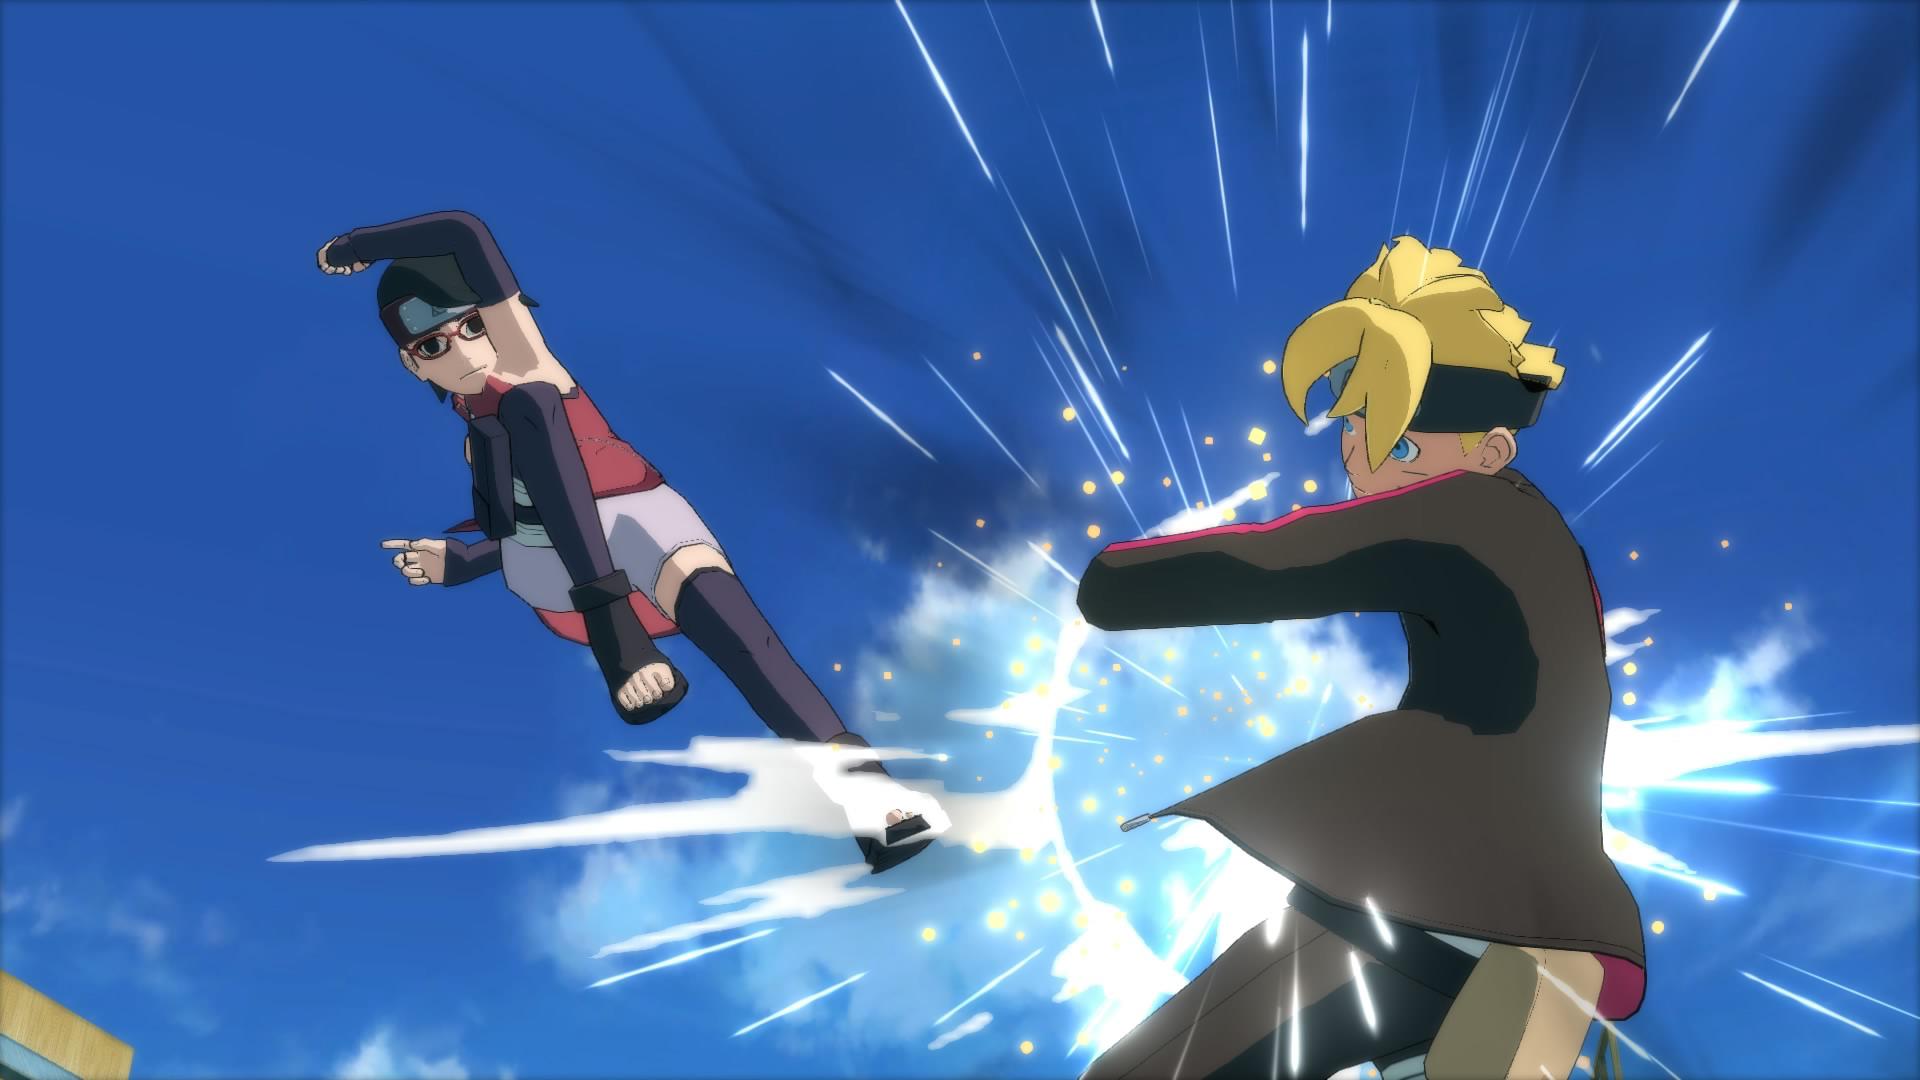 New Naruto Shippuden: Ultimate Ninja Storm 4 Trailer; Releases February 2016